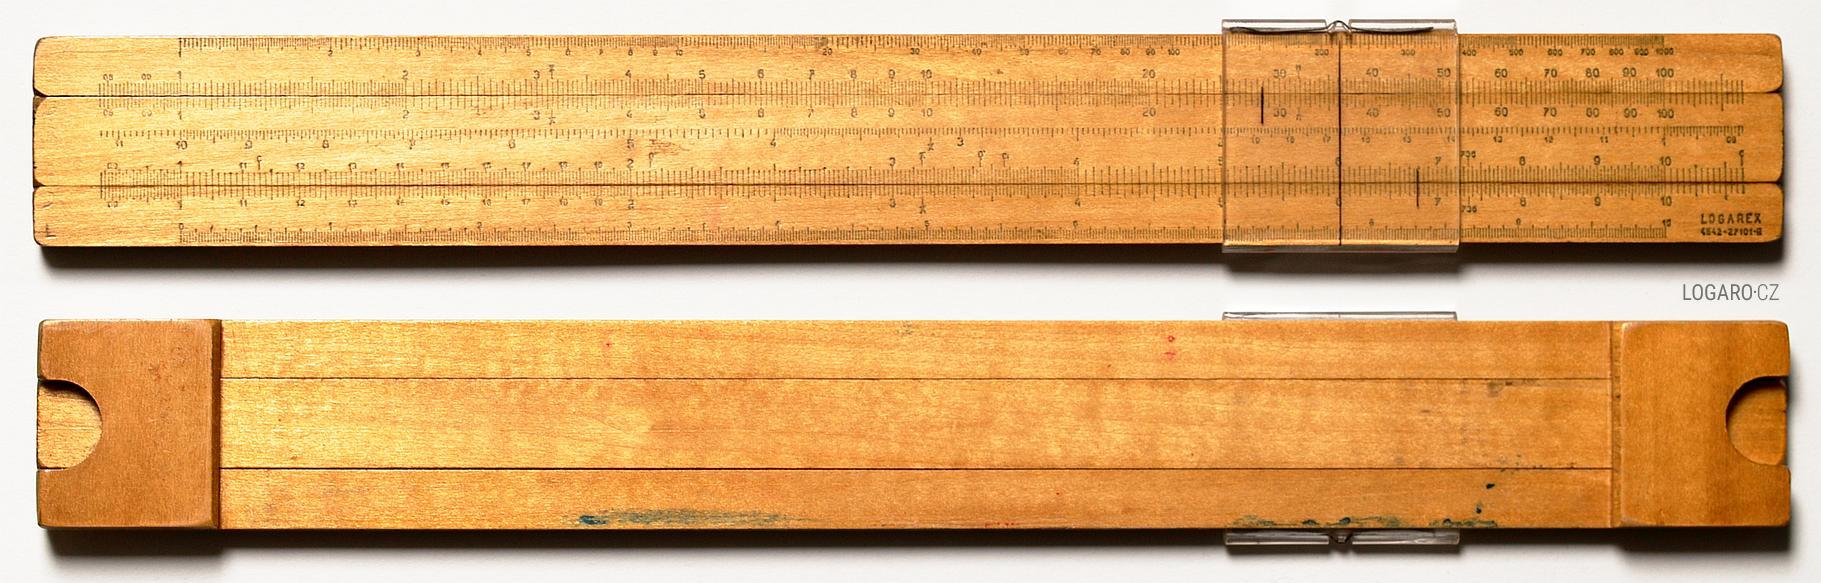 logarex-4542-27101-r-drevo